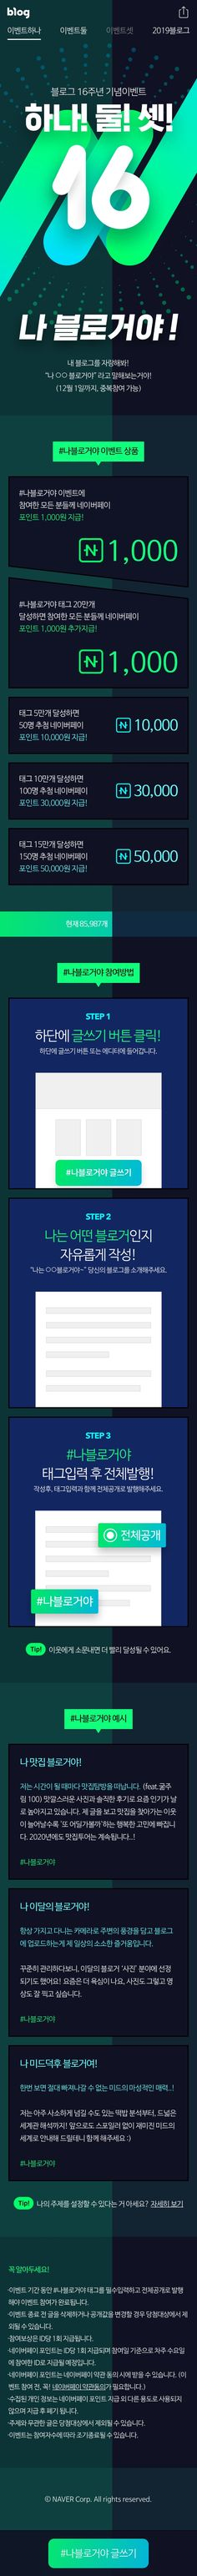 Mobile Ui Design, Promotional Design, Web Design, Graphic Design, Event Page, App Ui, Popup, Typo, Contents